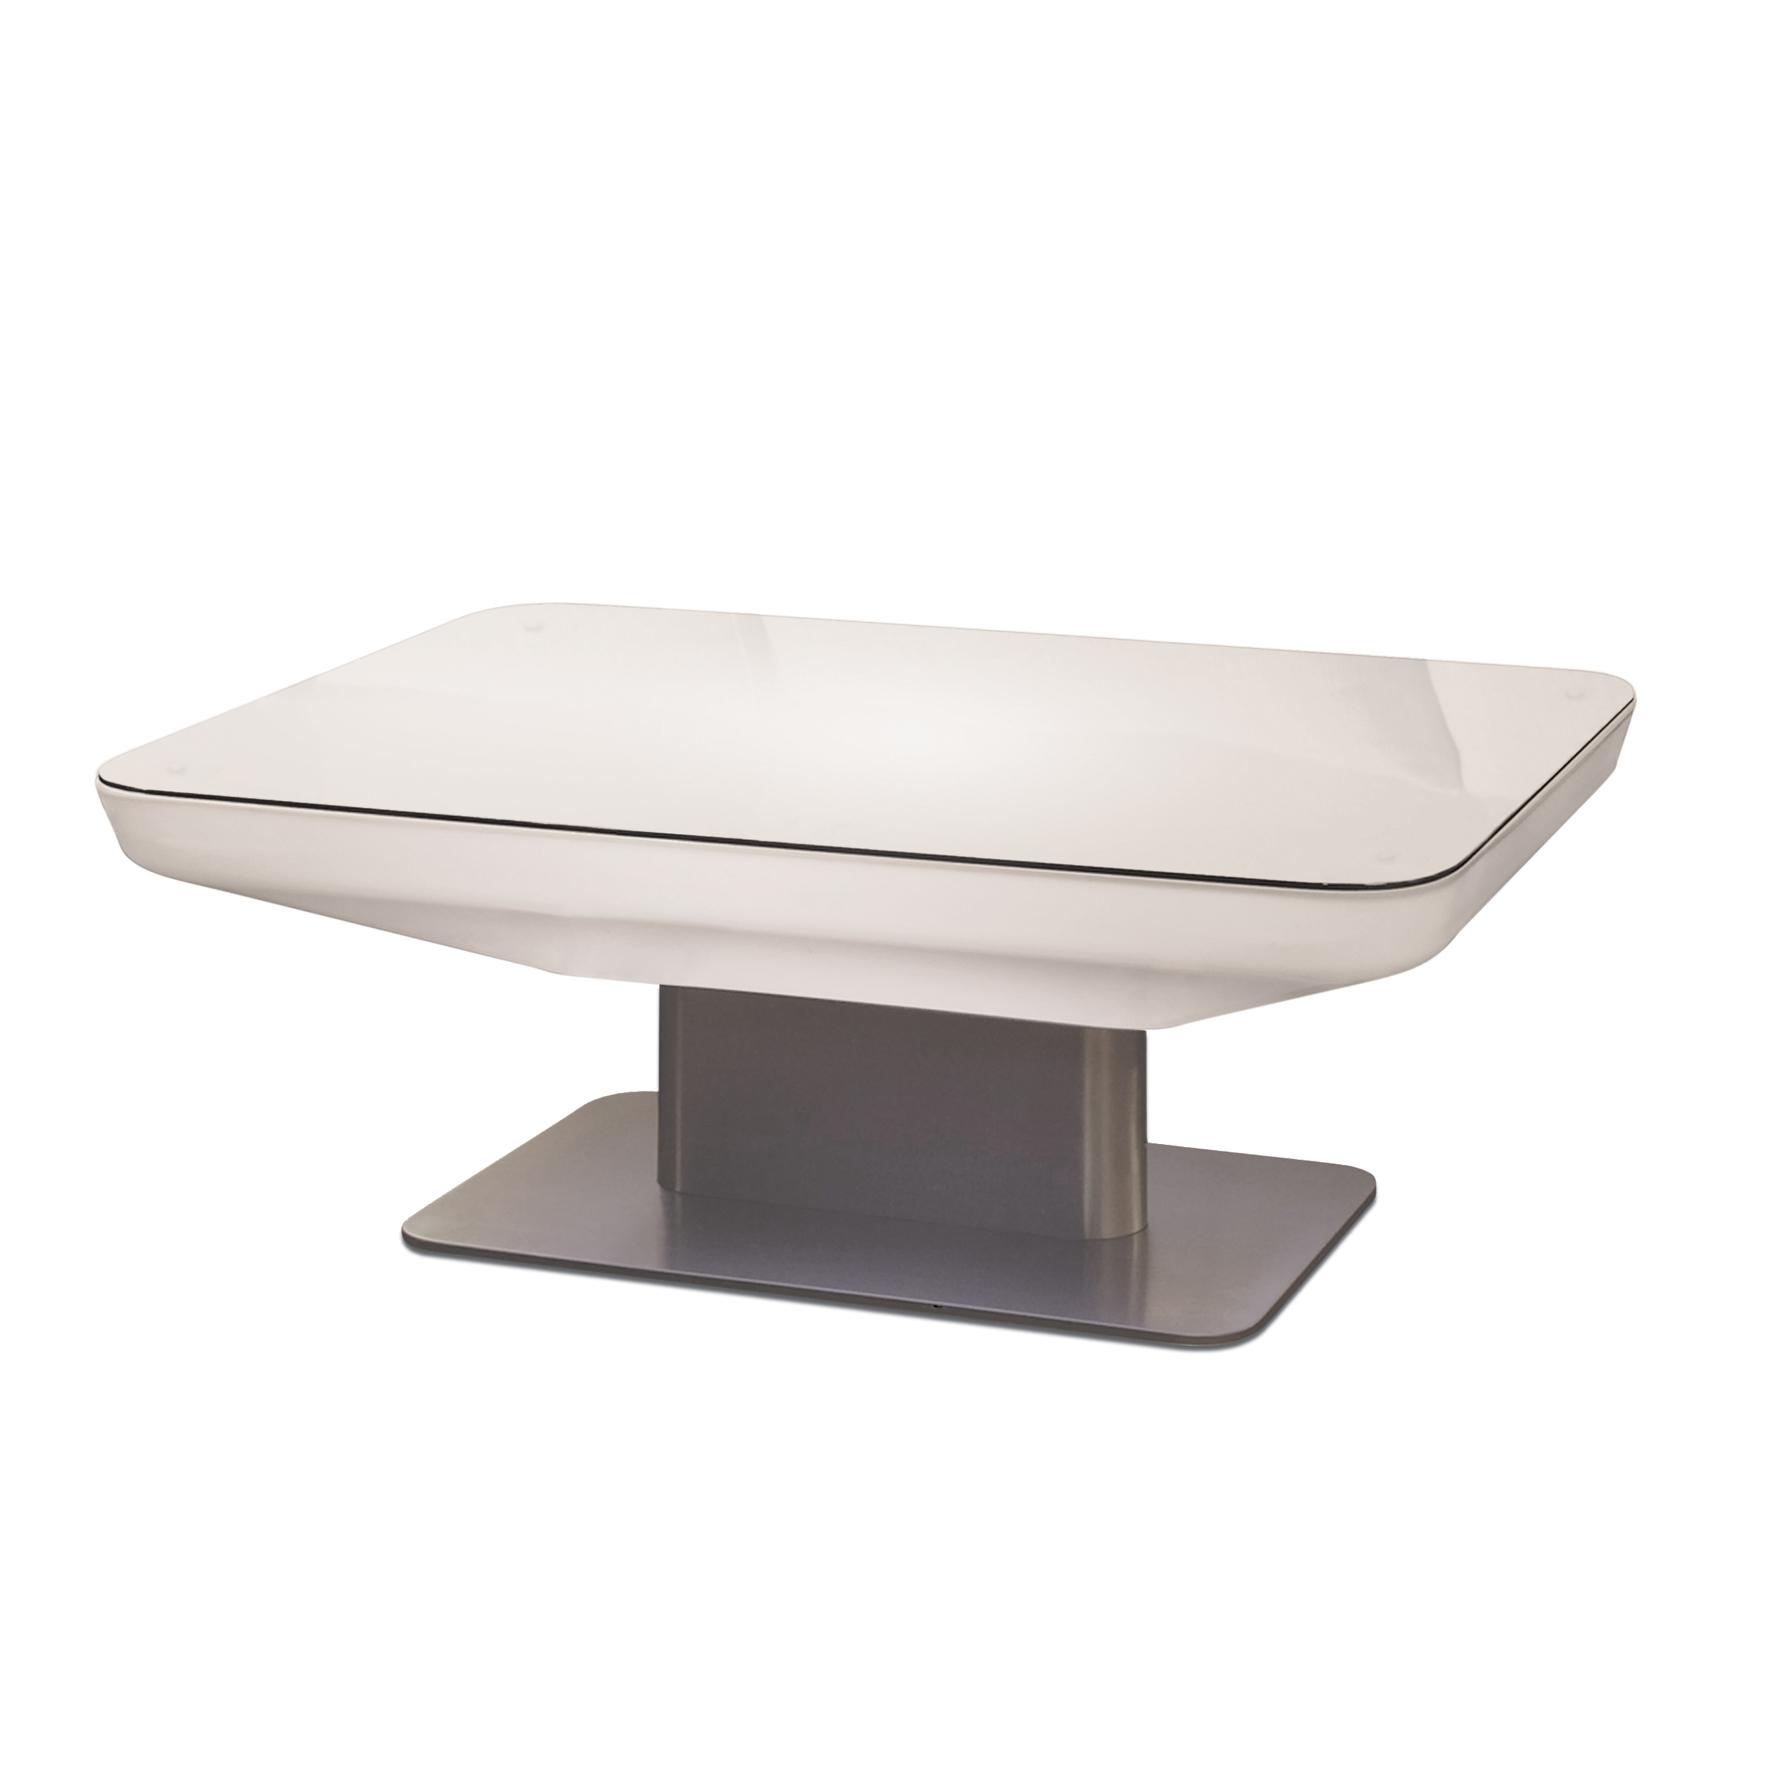 studio leucht tisch outdoor. Black Bedroom Furniture Sets. Home Design Ideas